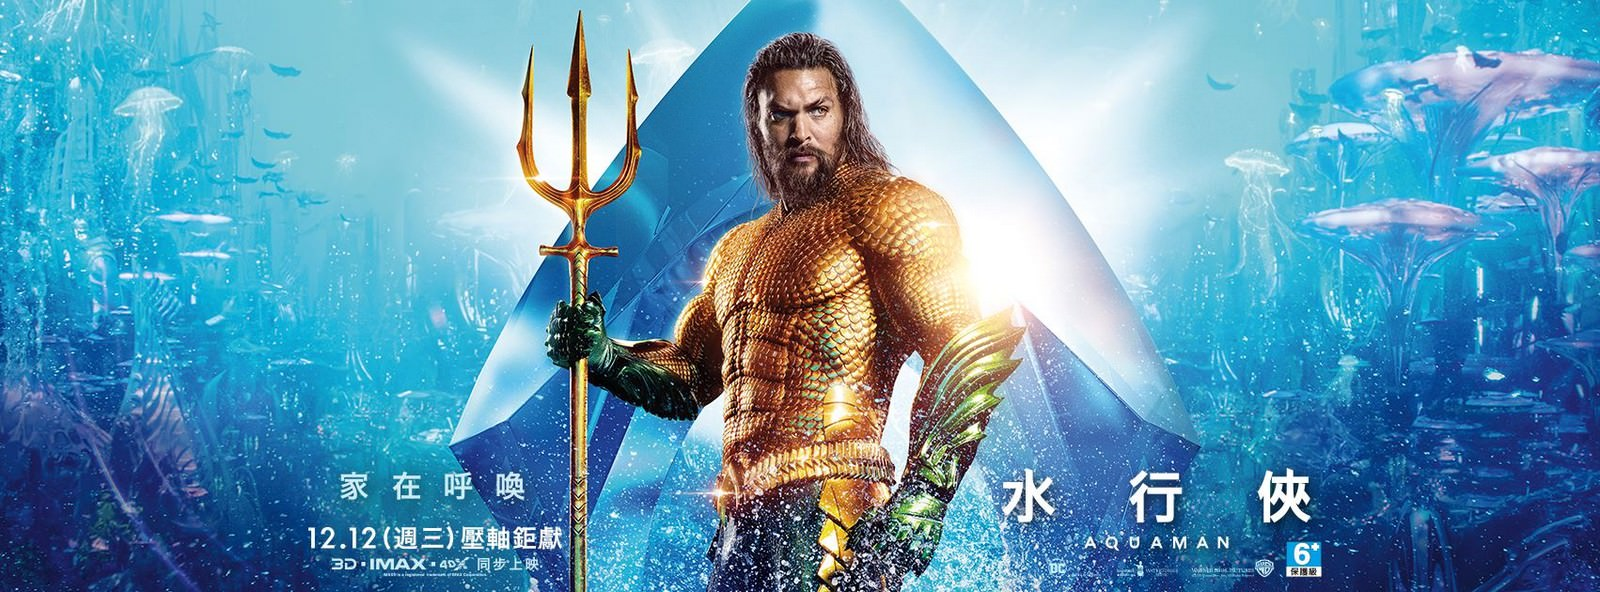 Movie, Aquaman(美國, 2018年) / 水行俠(台灣.香港) / 海王(中國), 電影海報, 台灣, 橫版